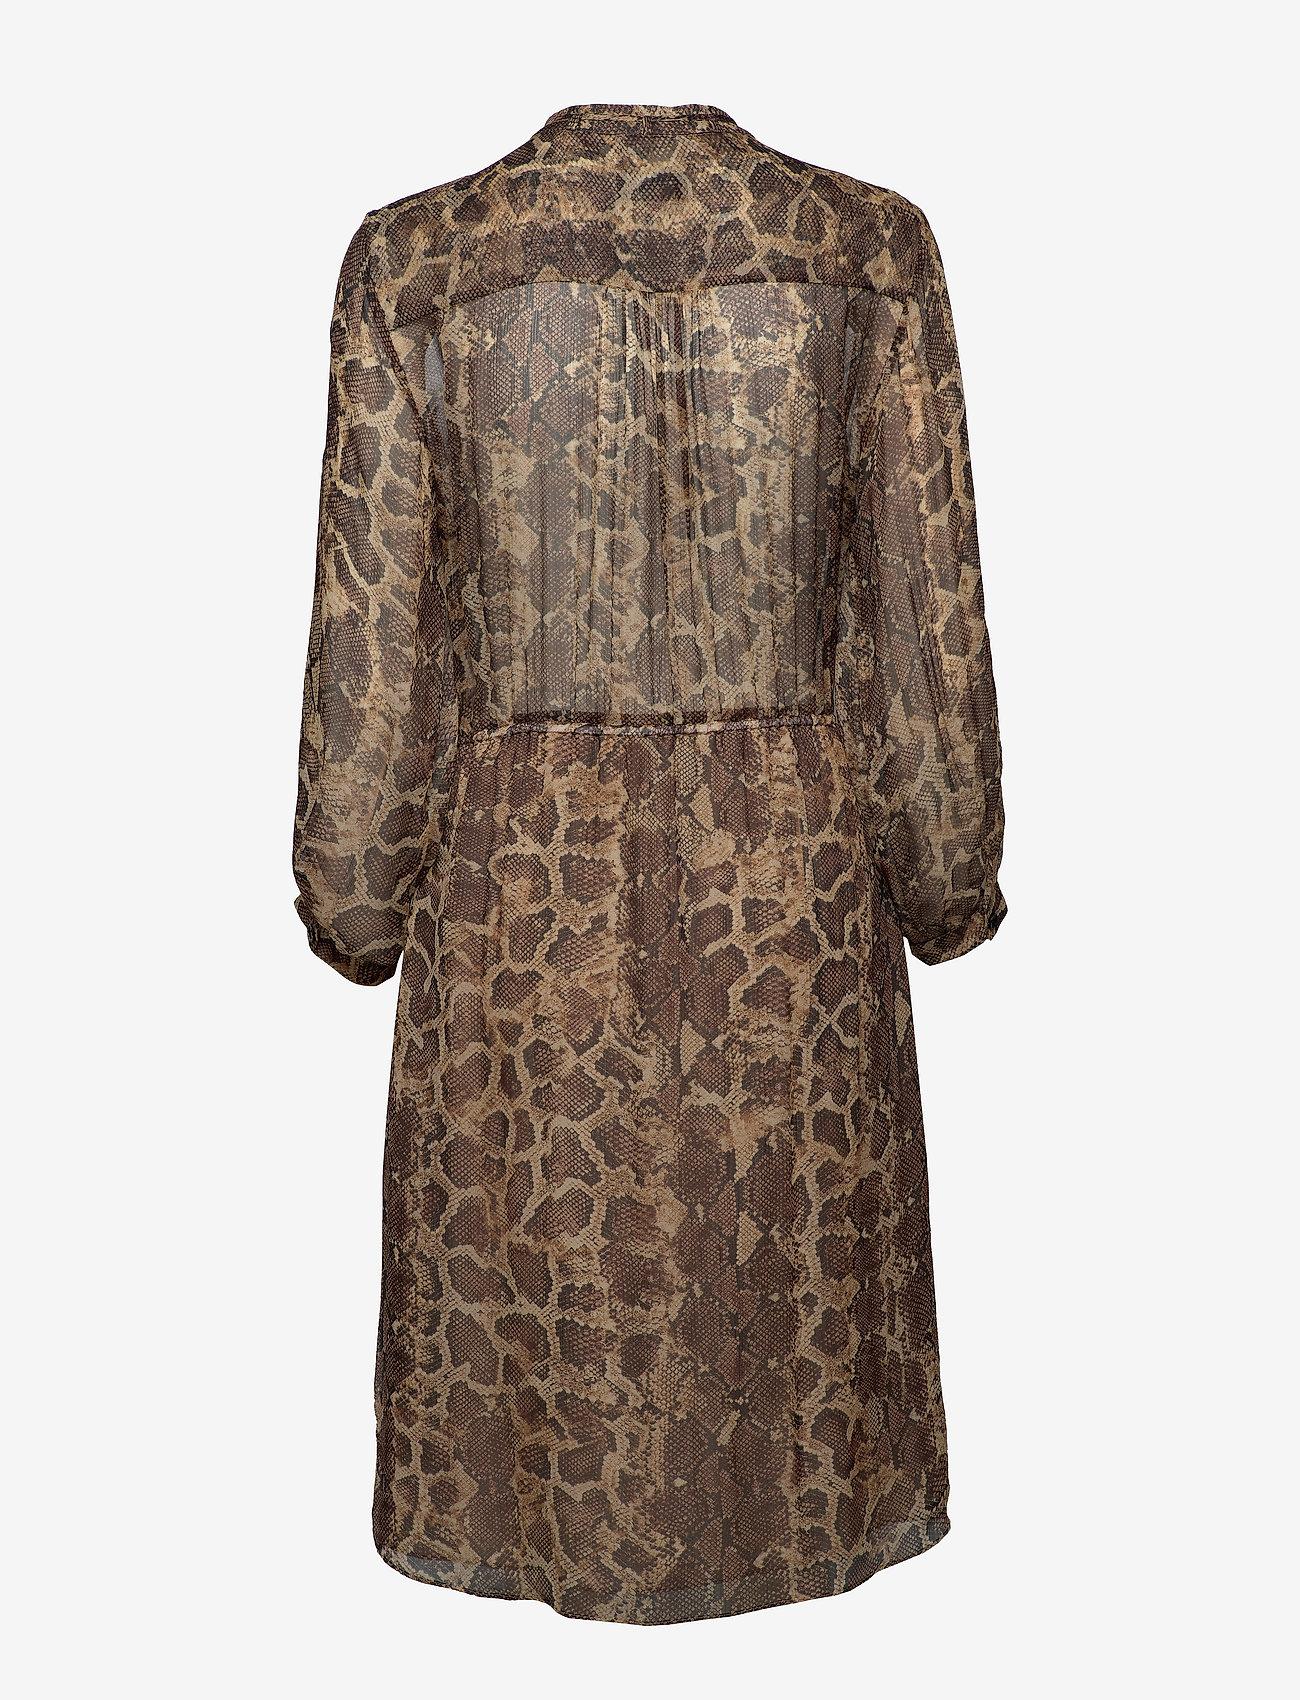 SAND - 3400 - Arlet - robes midi - pattern - 1